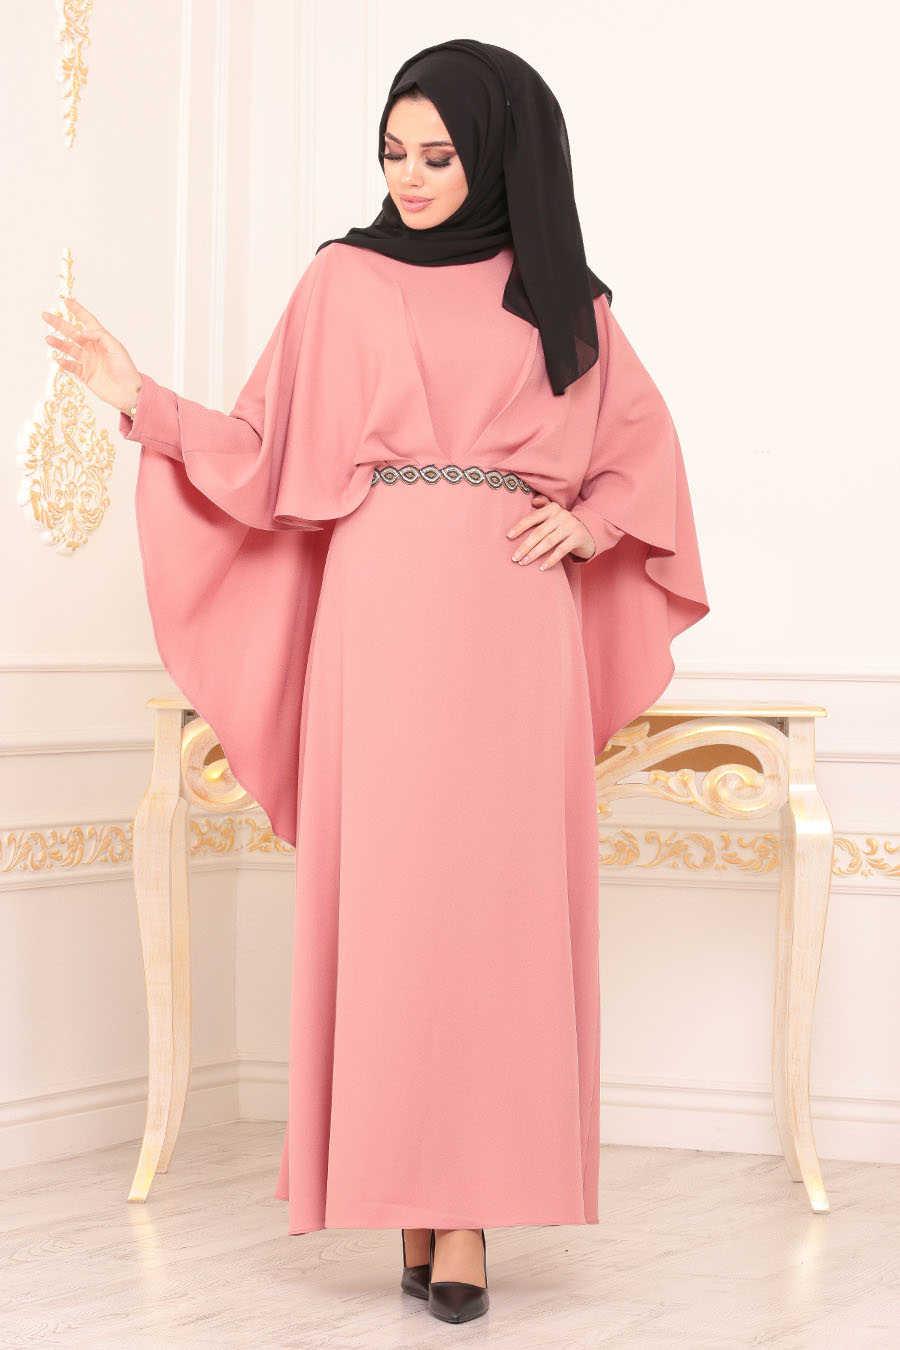 Neva Style - Powder Pink Hijab Evening Dress 5002PD